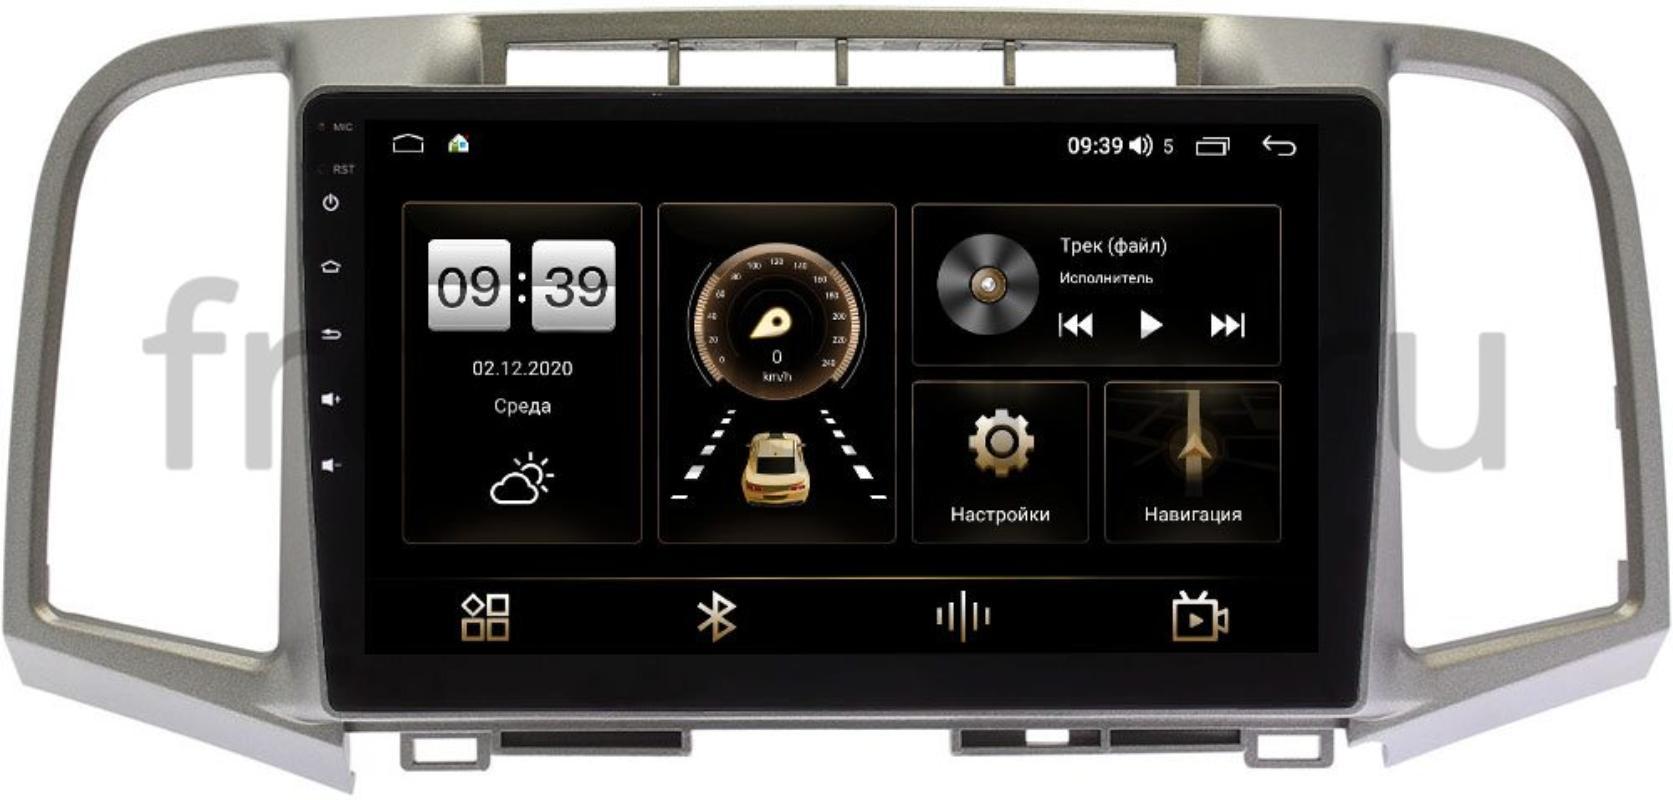 Штатная магнитола Toyota Venza 2009-2017 (без JBL) LeTrun 4166-9358 на Android 10 (4G-SIM, 3/32, DSP, QLed) (+ Камера заднего вида в подарок!)